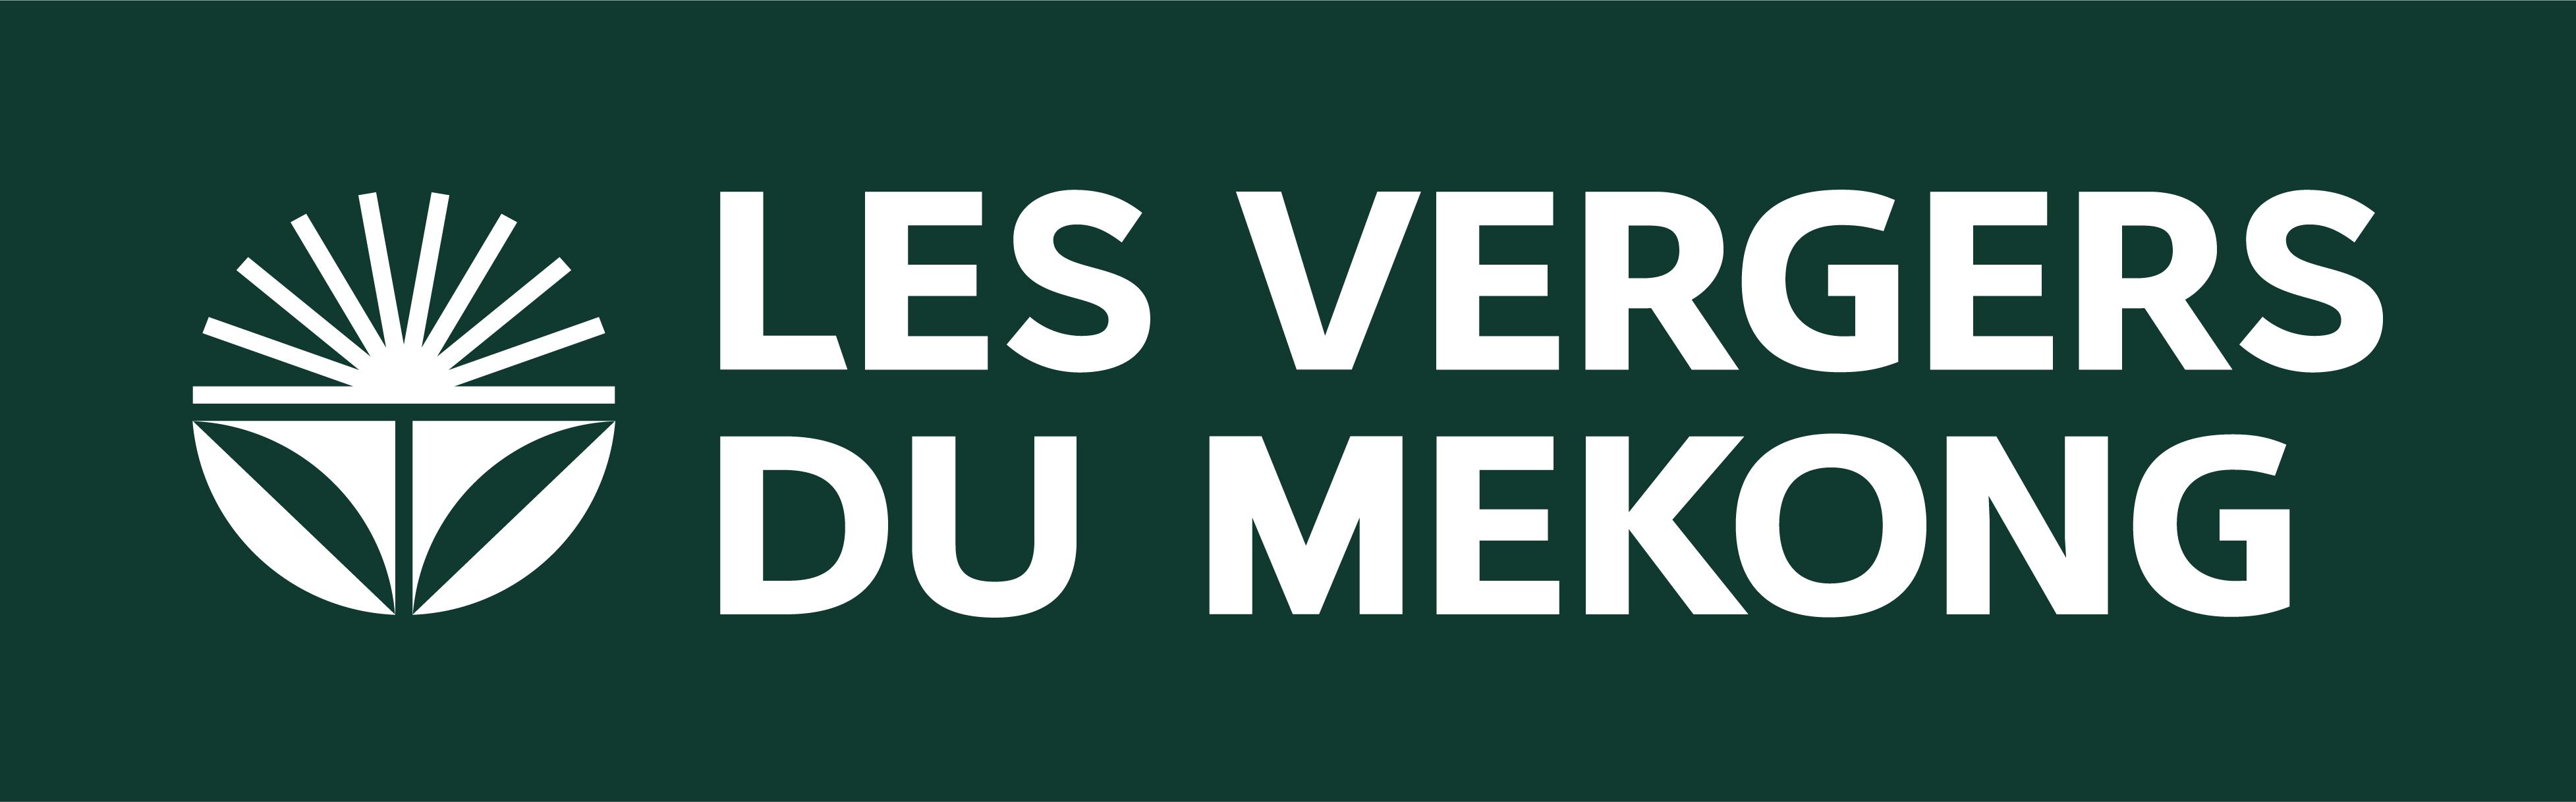 Logo for LES VERGERS DU MEKONG JSC